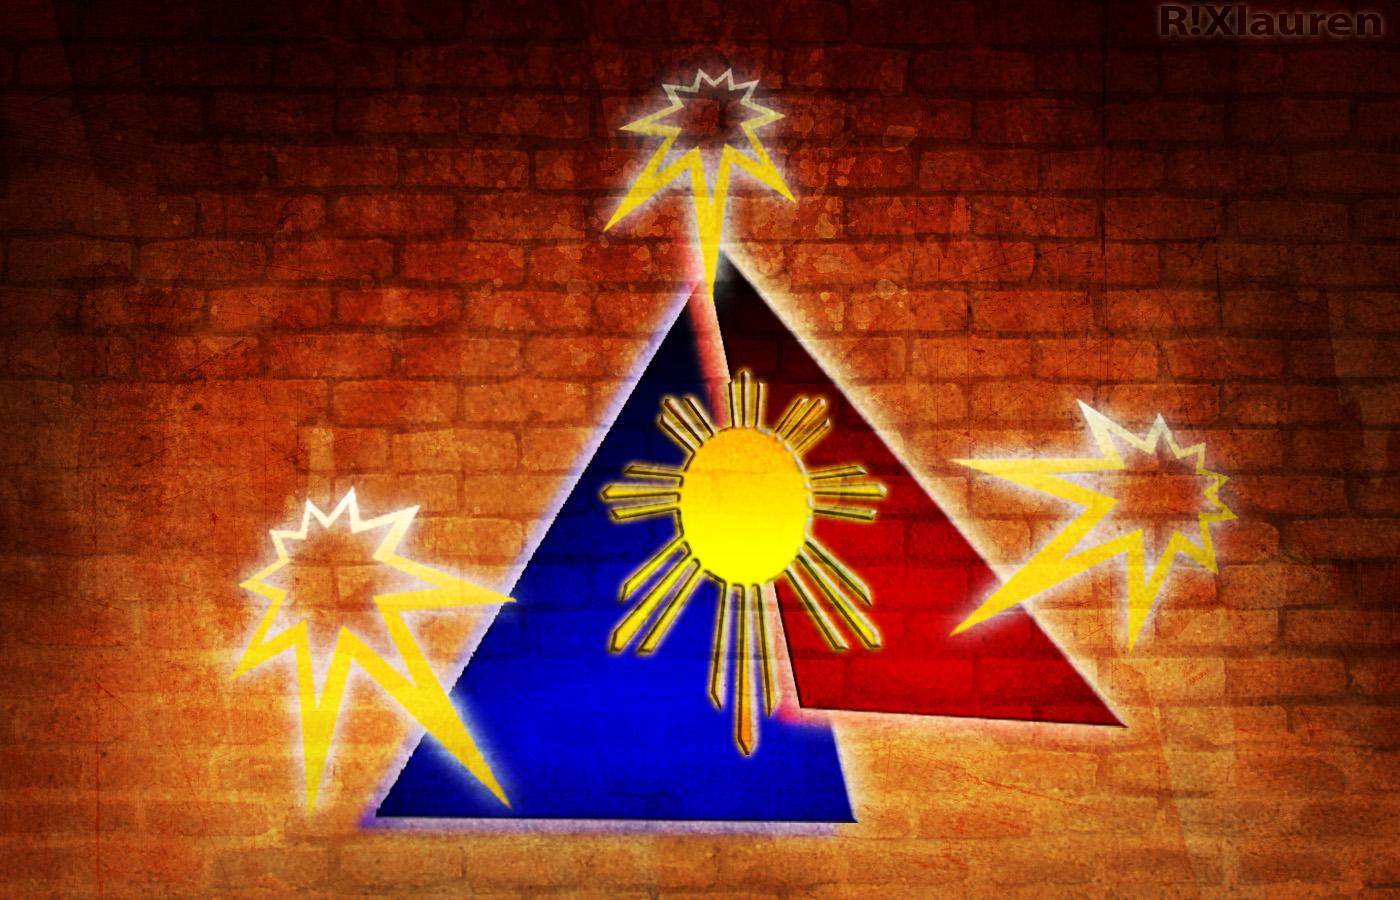 1000+ ideas about Philippines Flag on Pinterest ...  1000+ ideas abo...